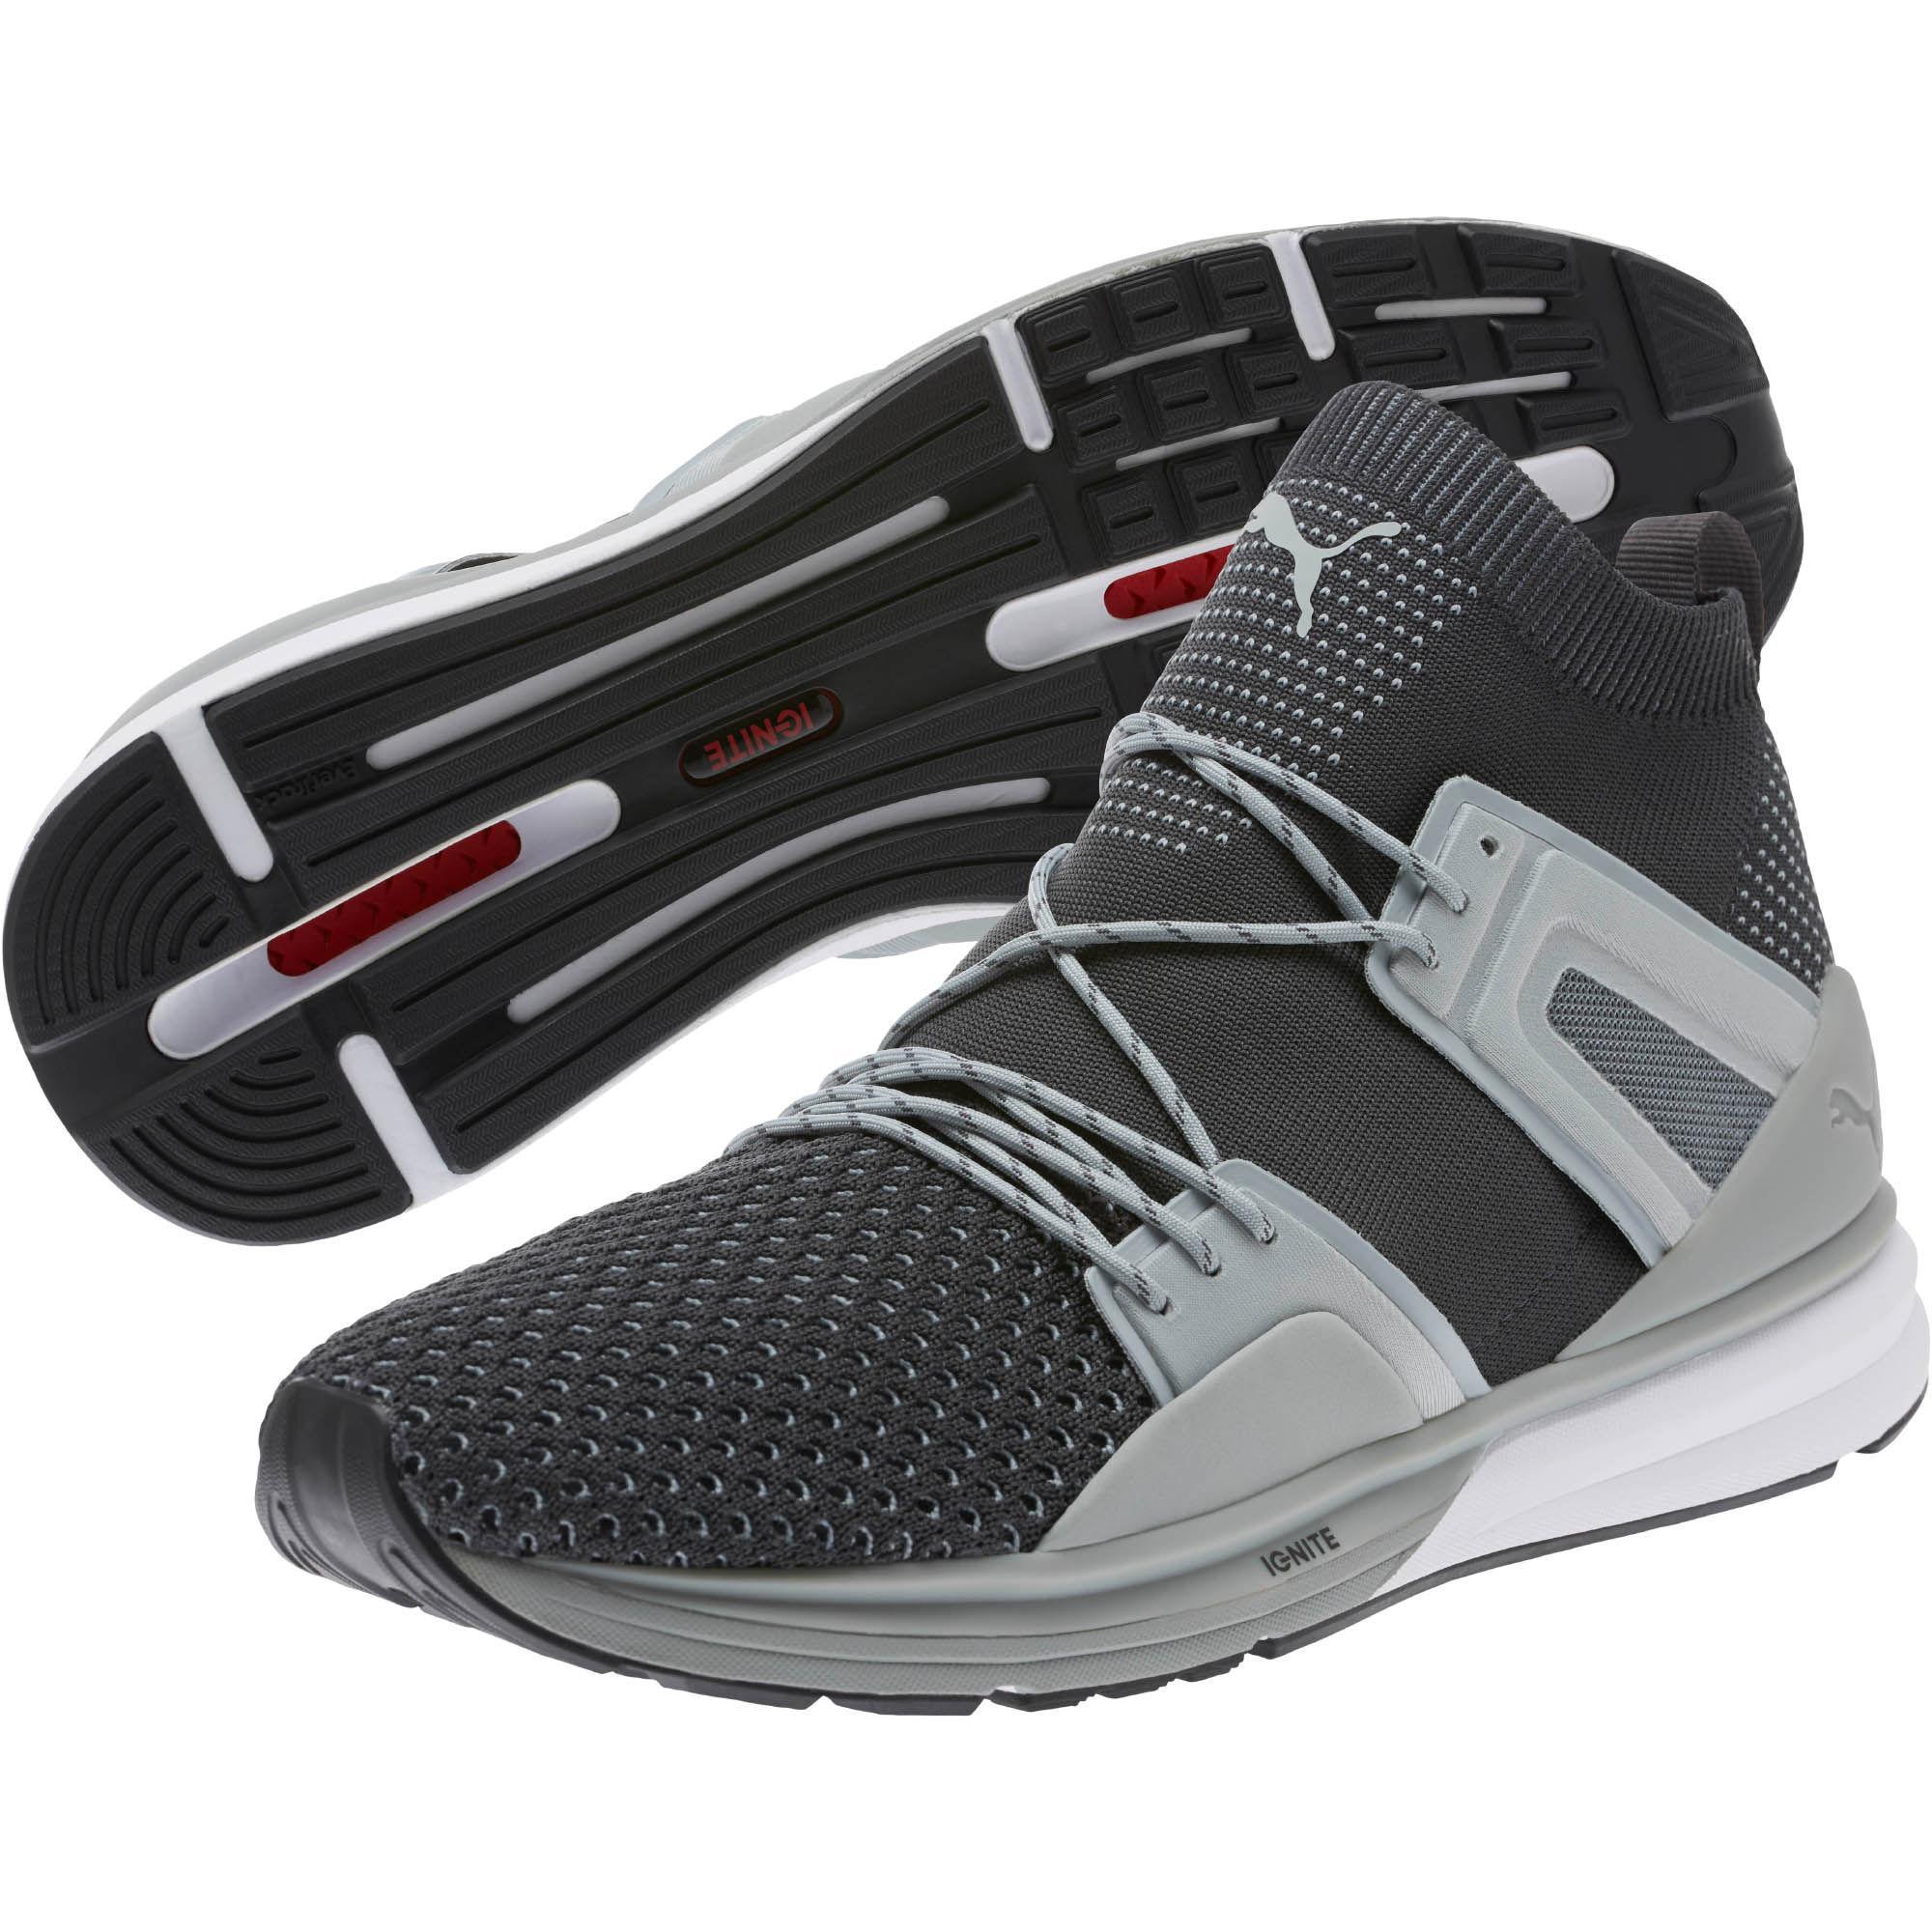 Limitless o For Men's B Evoknit Training Puma Hi Men g Shoes Lyst RTxE7qIn